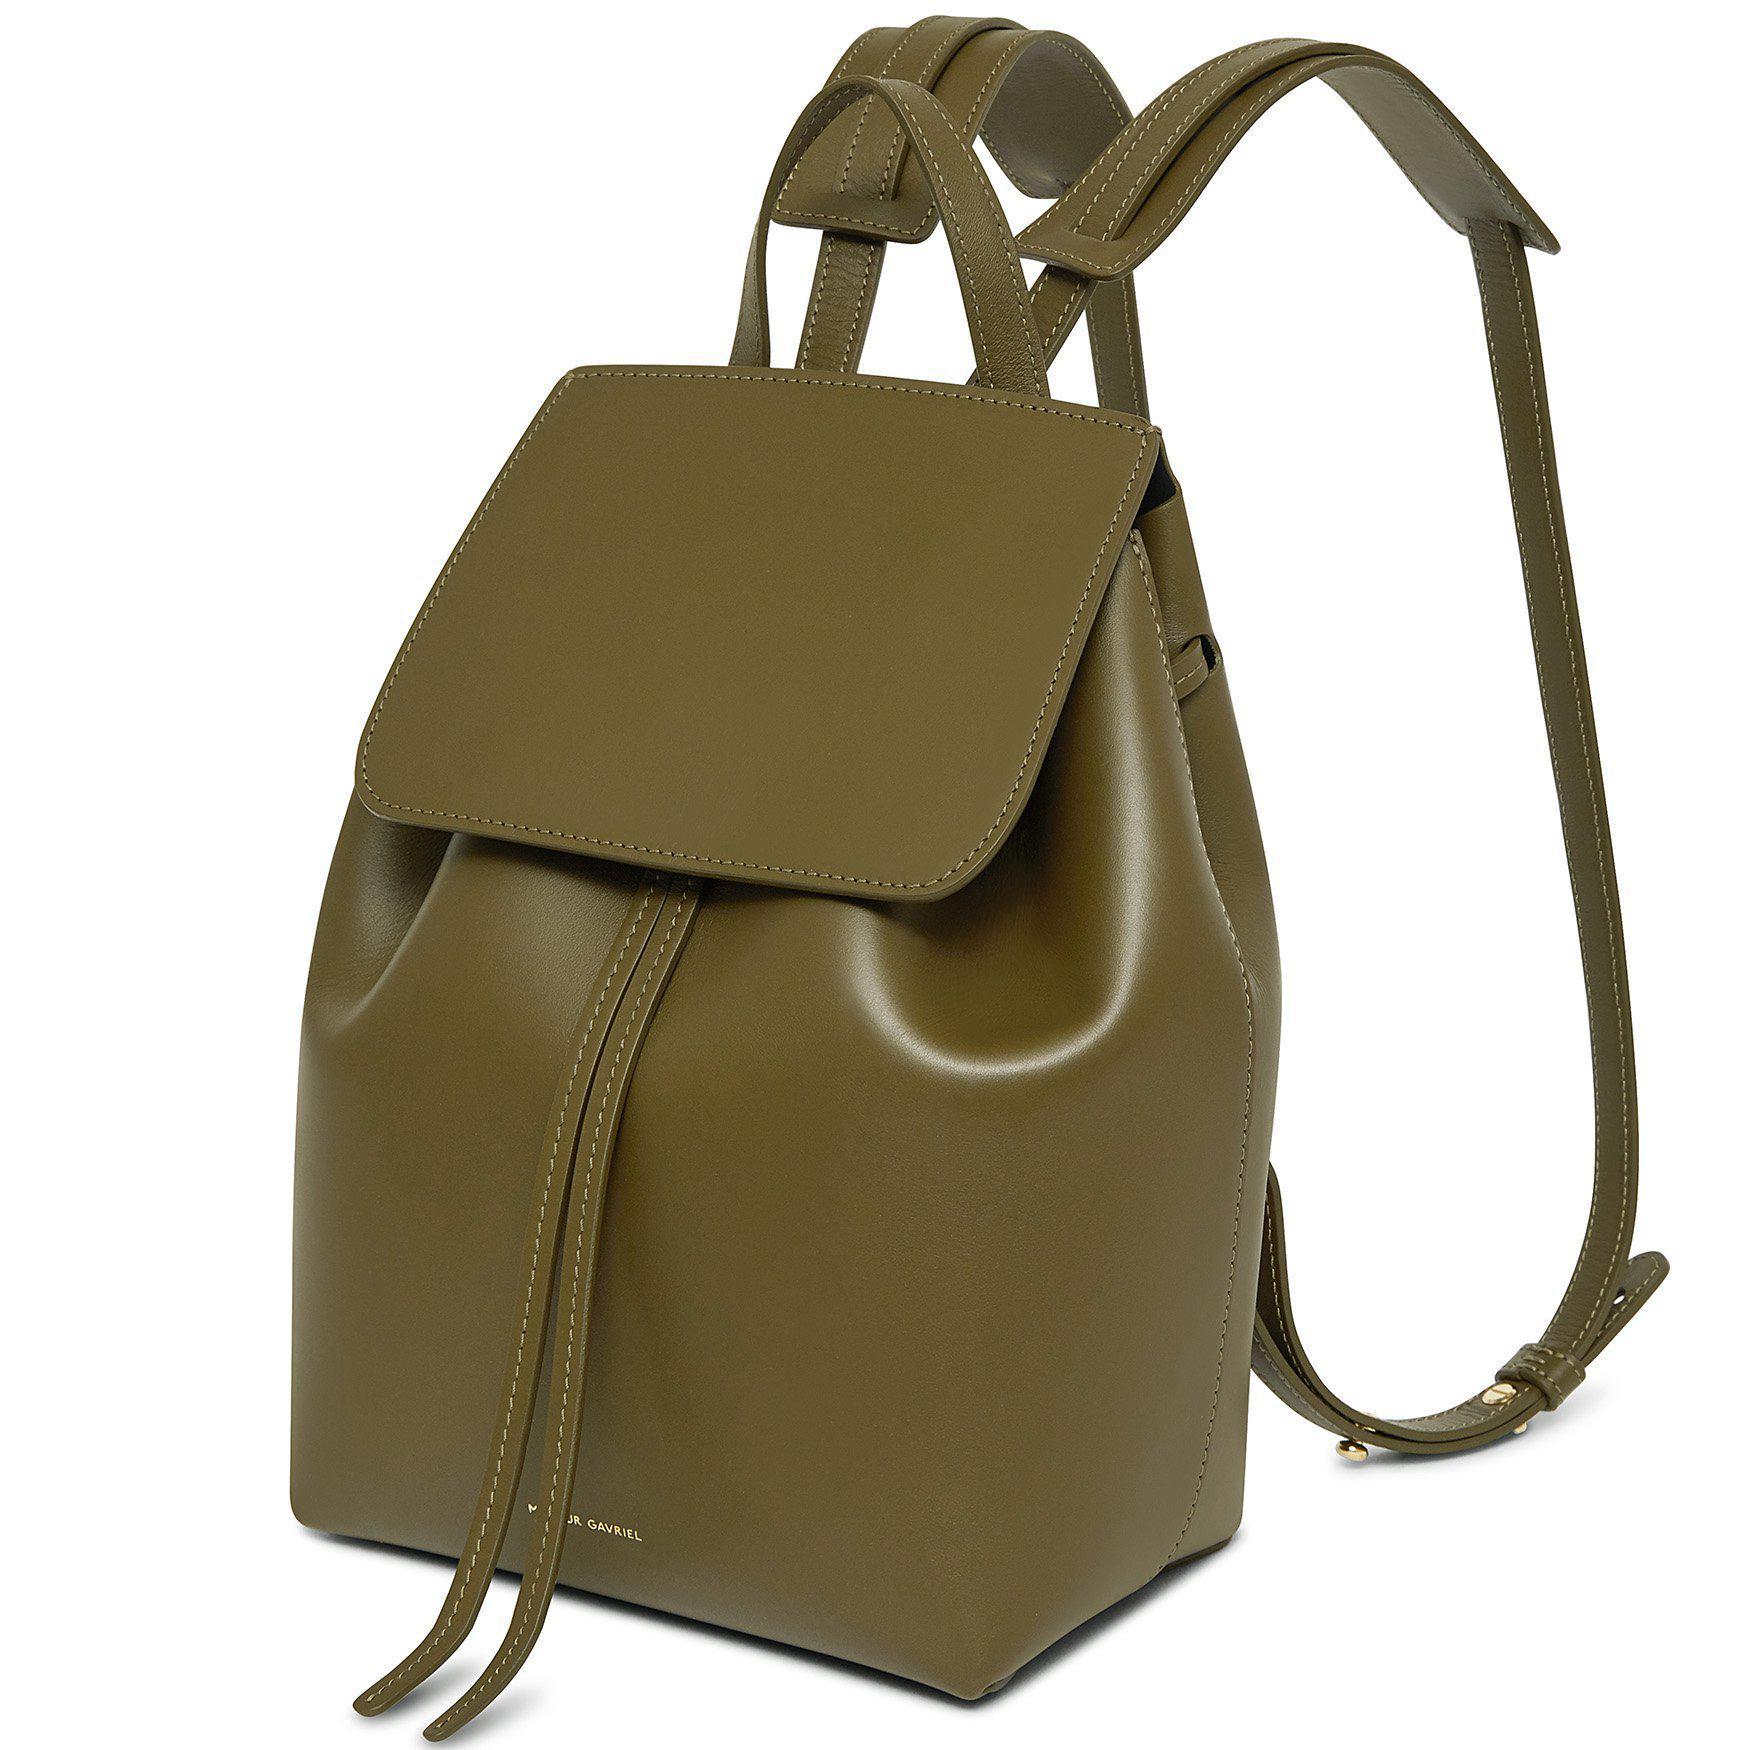 Mansur Gavriel Leather Calf Mini Backpack - Olive in Green ...